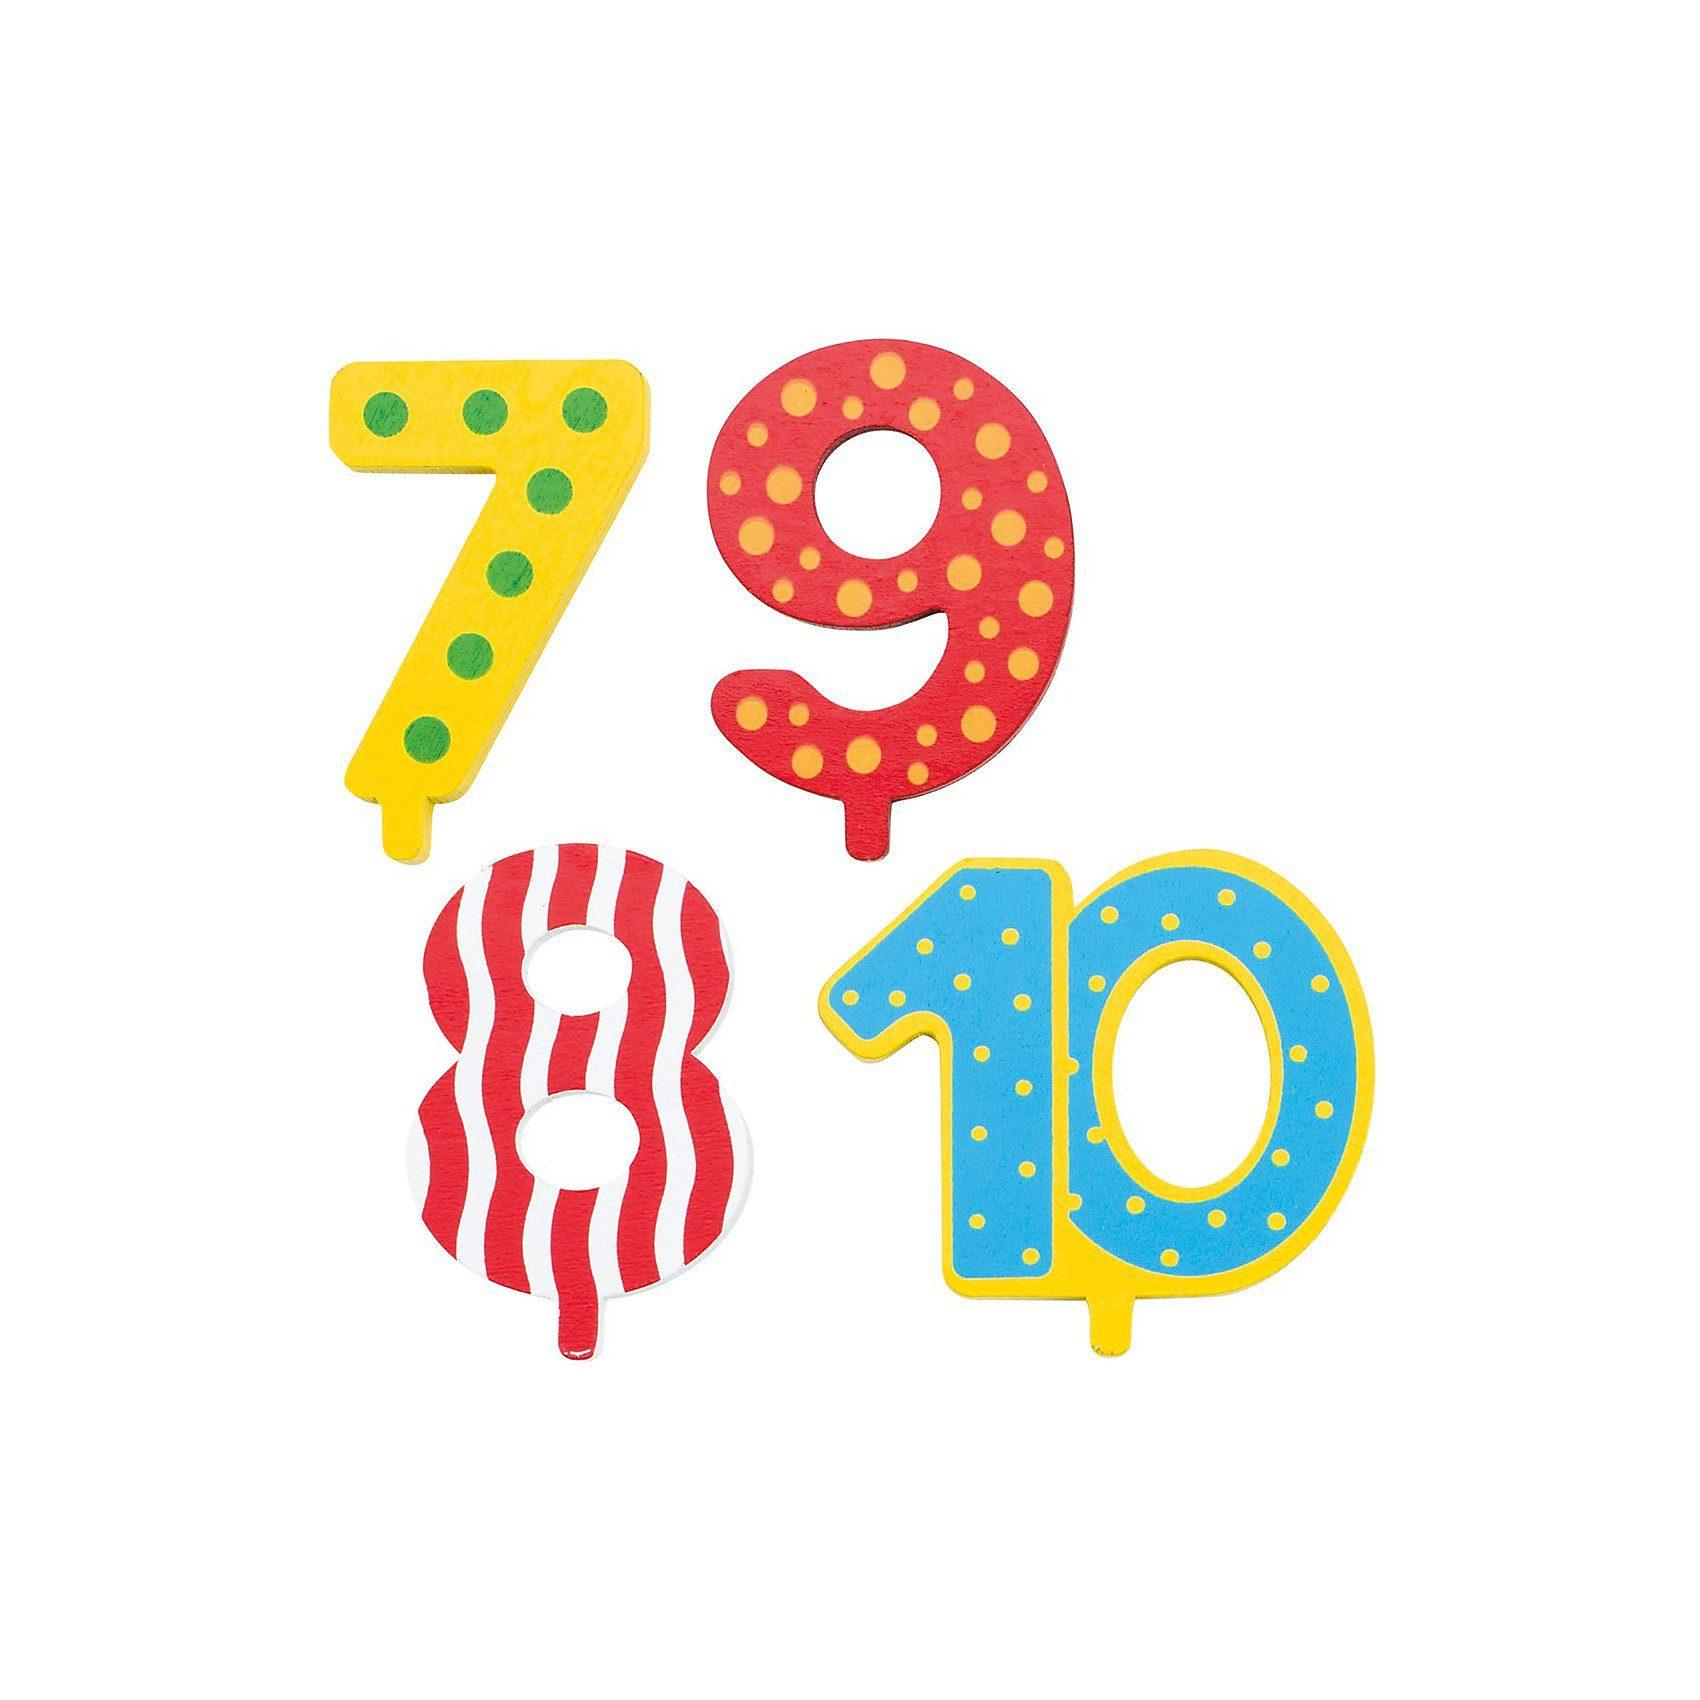 goki Zubehör Geburtstagszug Zahlen 7-10